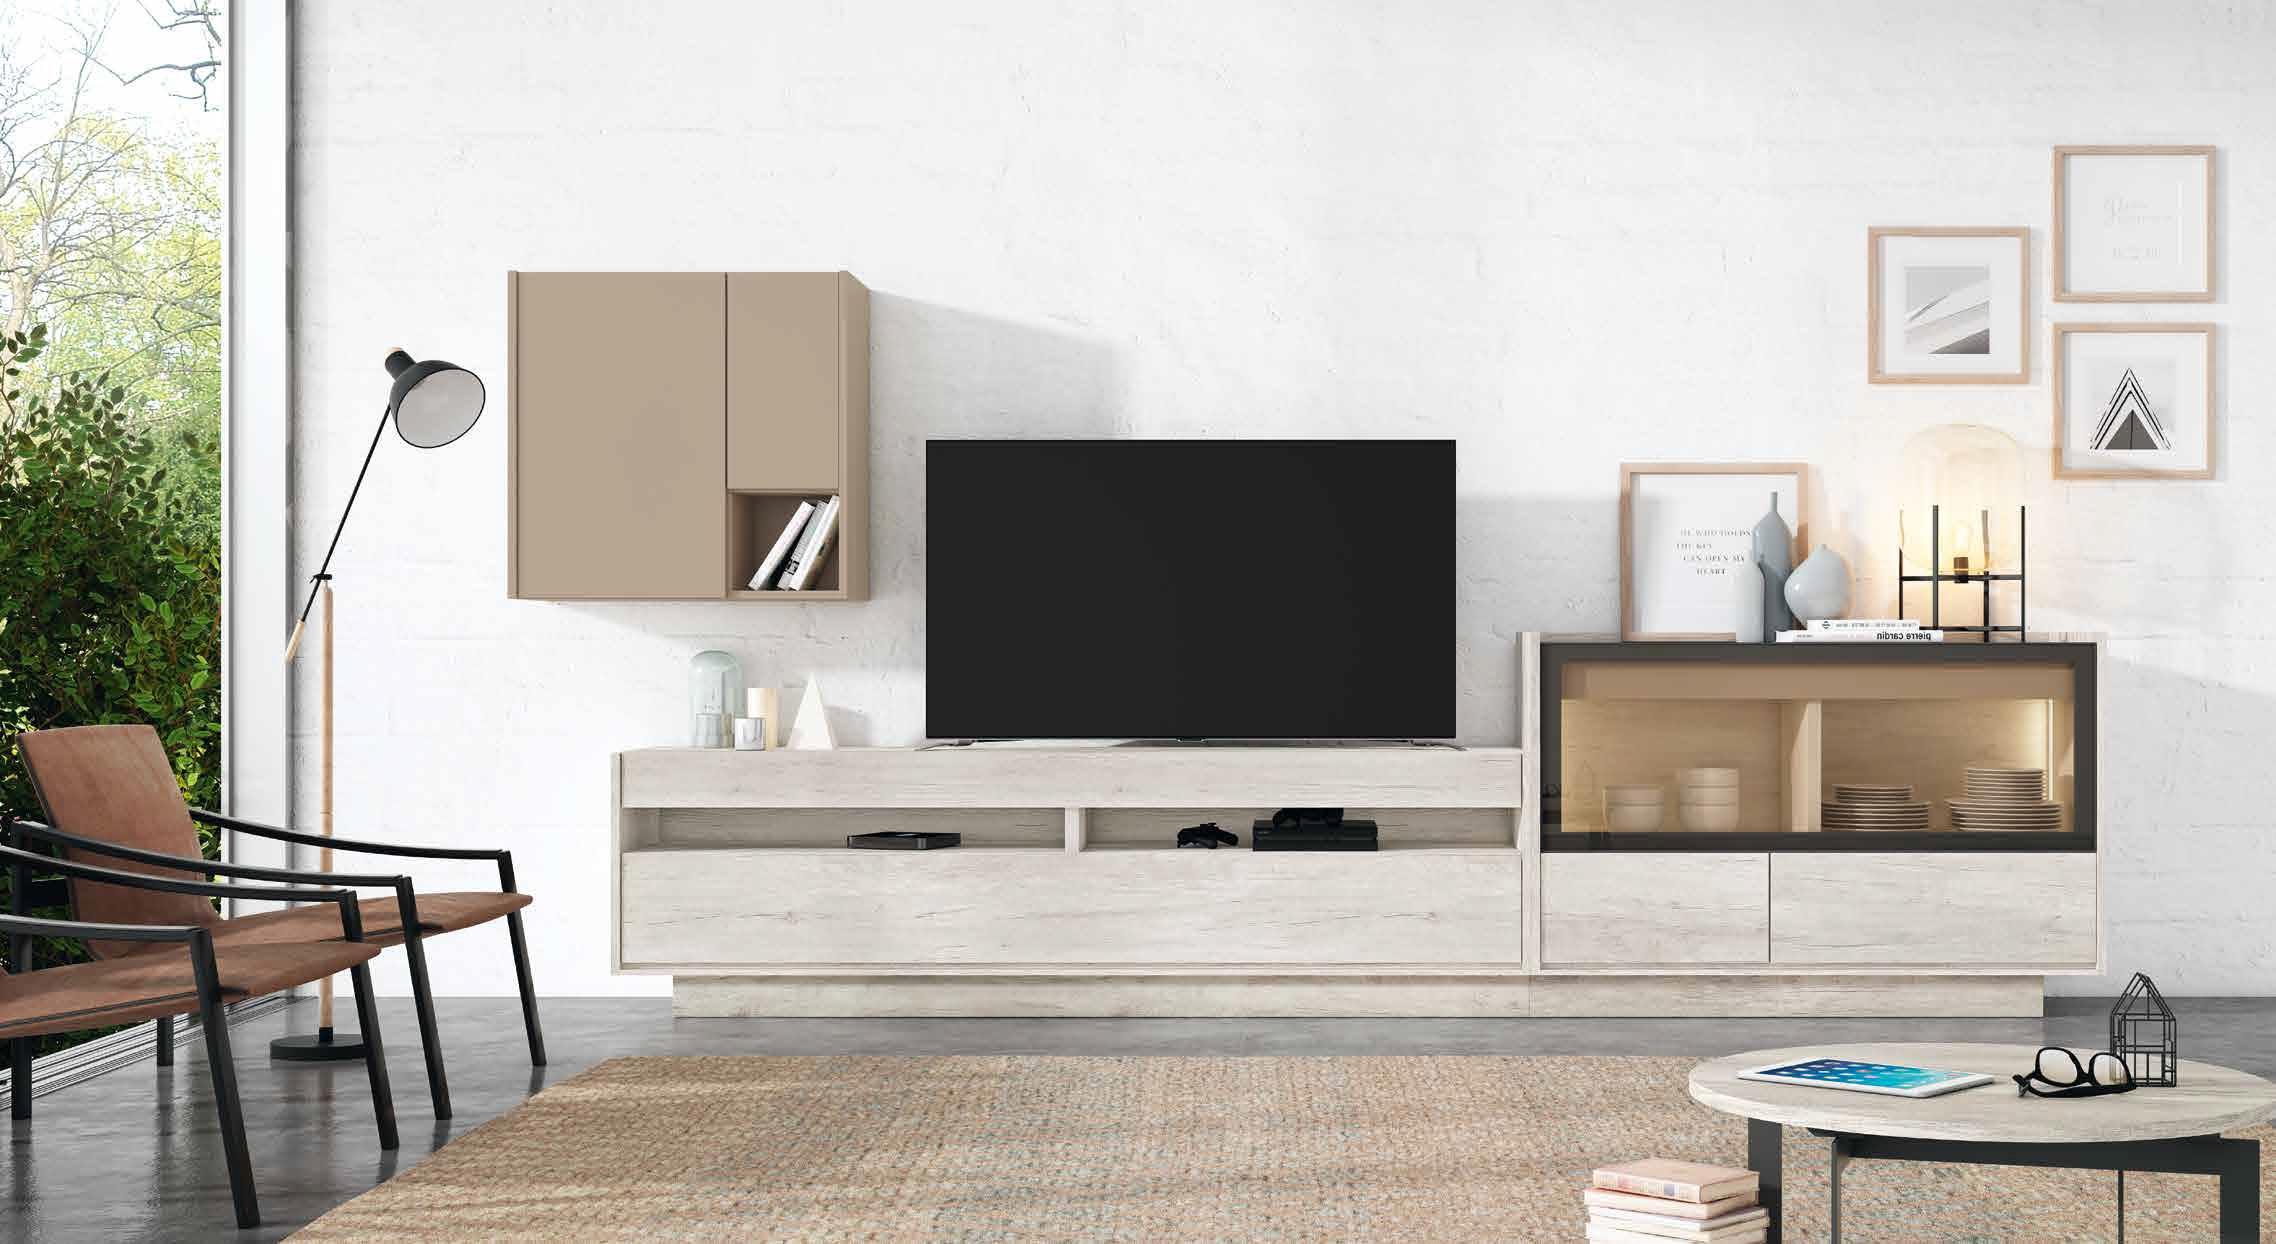 salon-moderno-Nativ-2019-muebles-paco-caballero-0920-5c8cea9aebb50